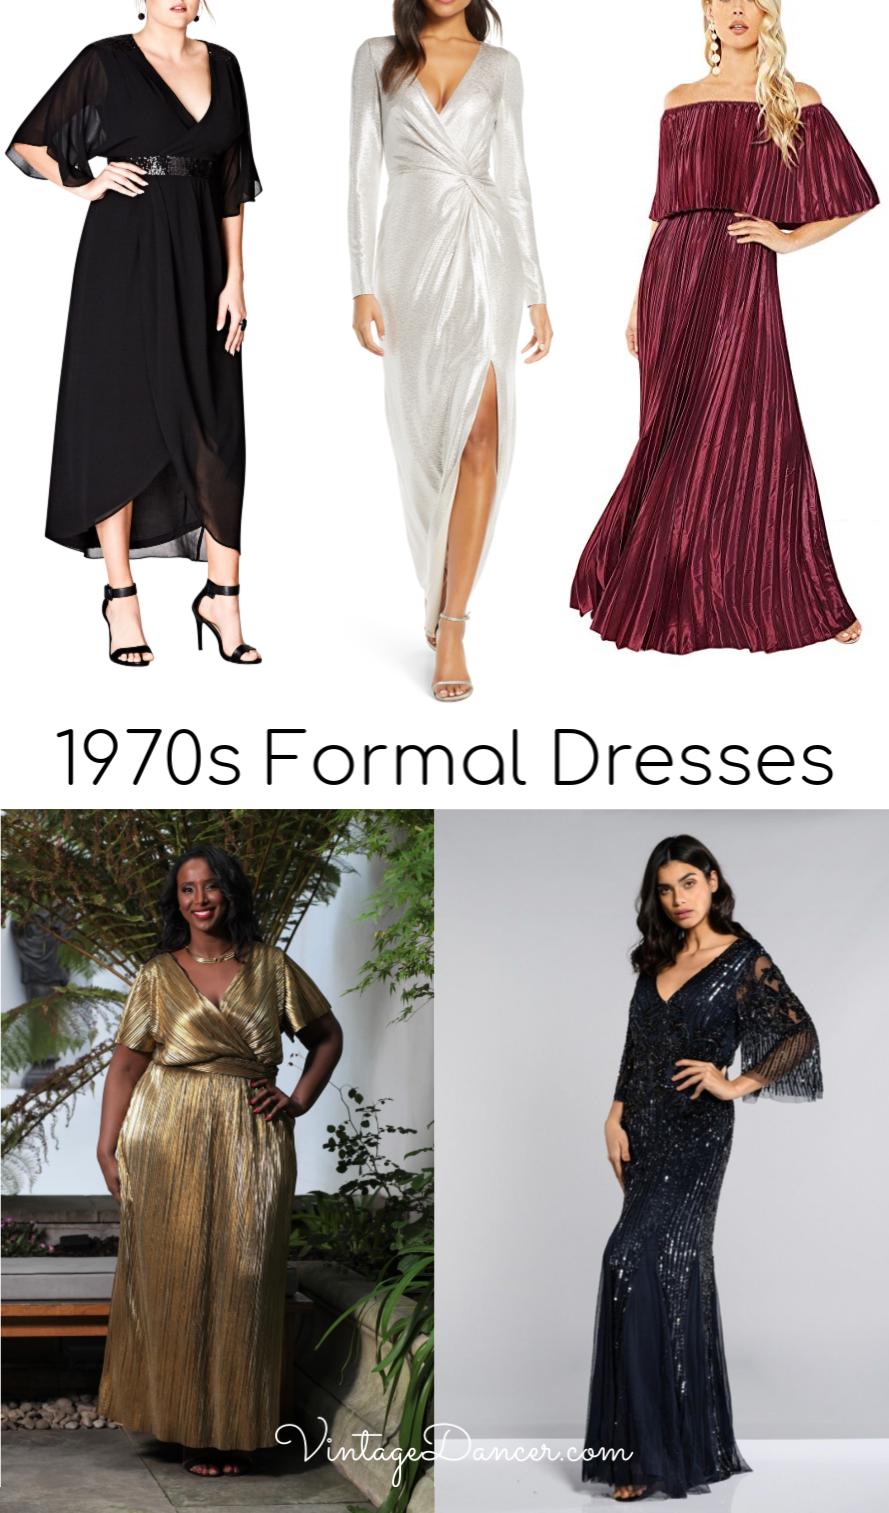 1970s Prom Dresses Formal Dresses Evening Dresses And Gowns 1970s Fashion Women Dresses Prom Dresses Vintage 70s Prom Dress Vintage [ 1513 x 889 Pixel ]